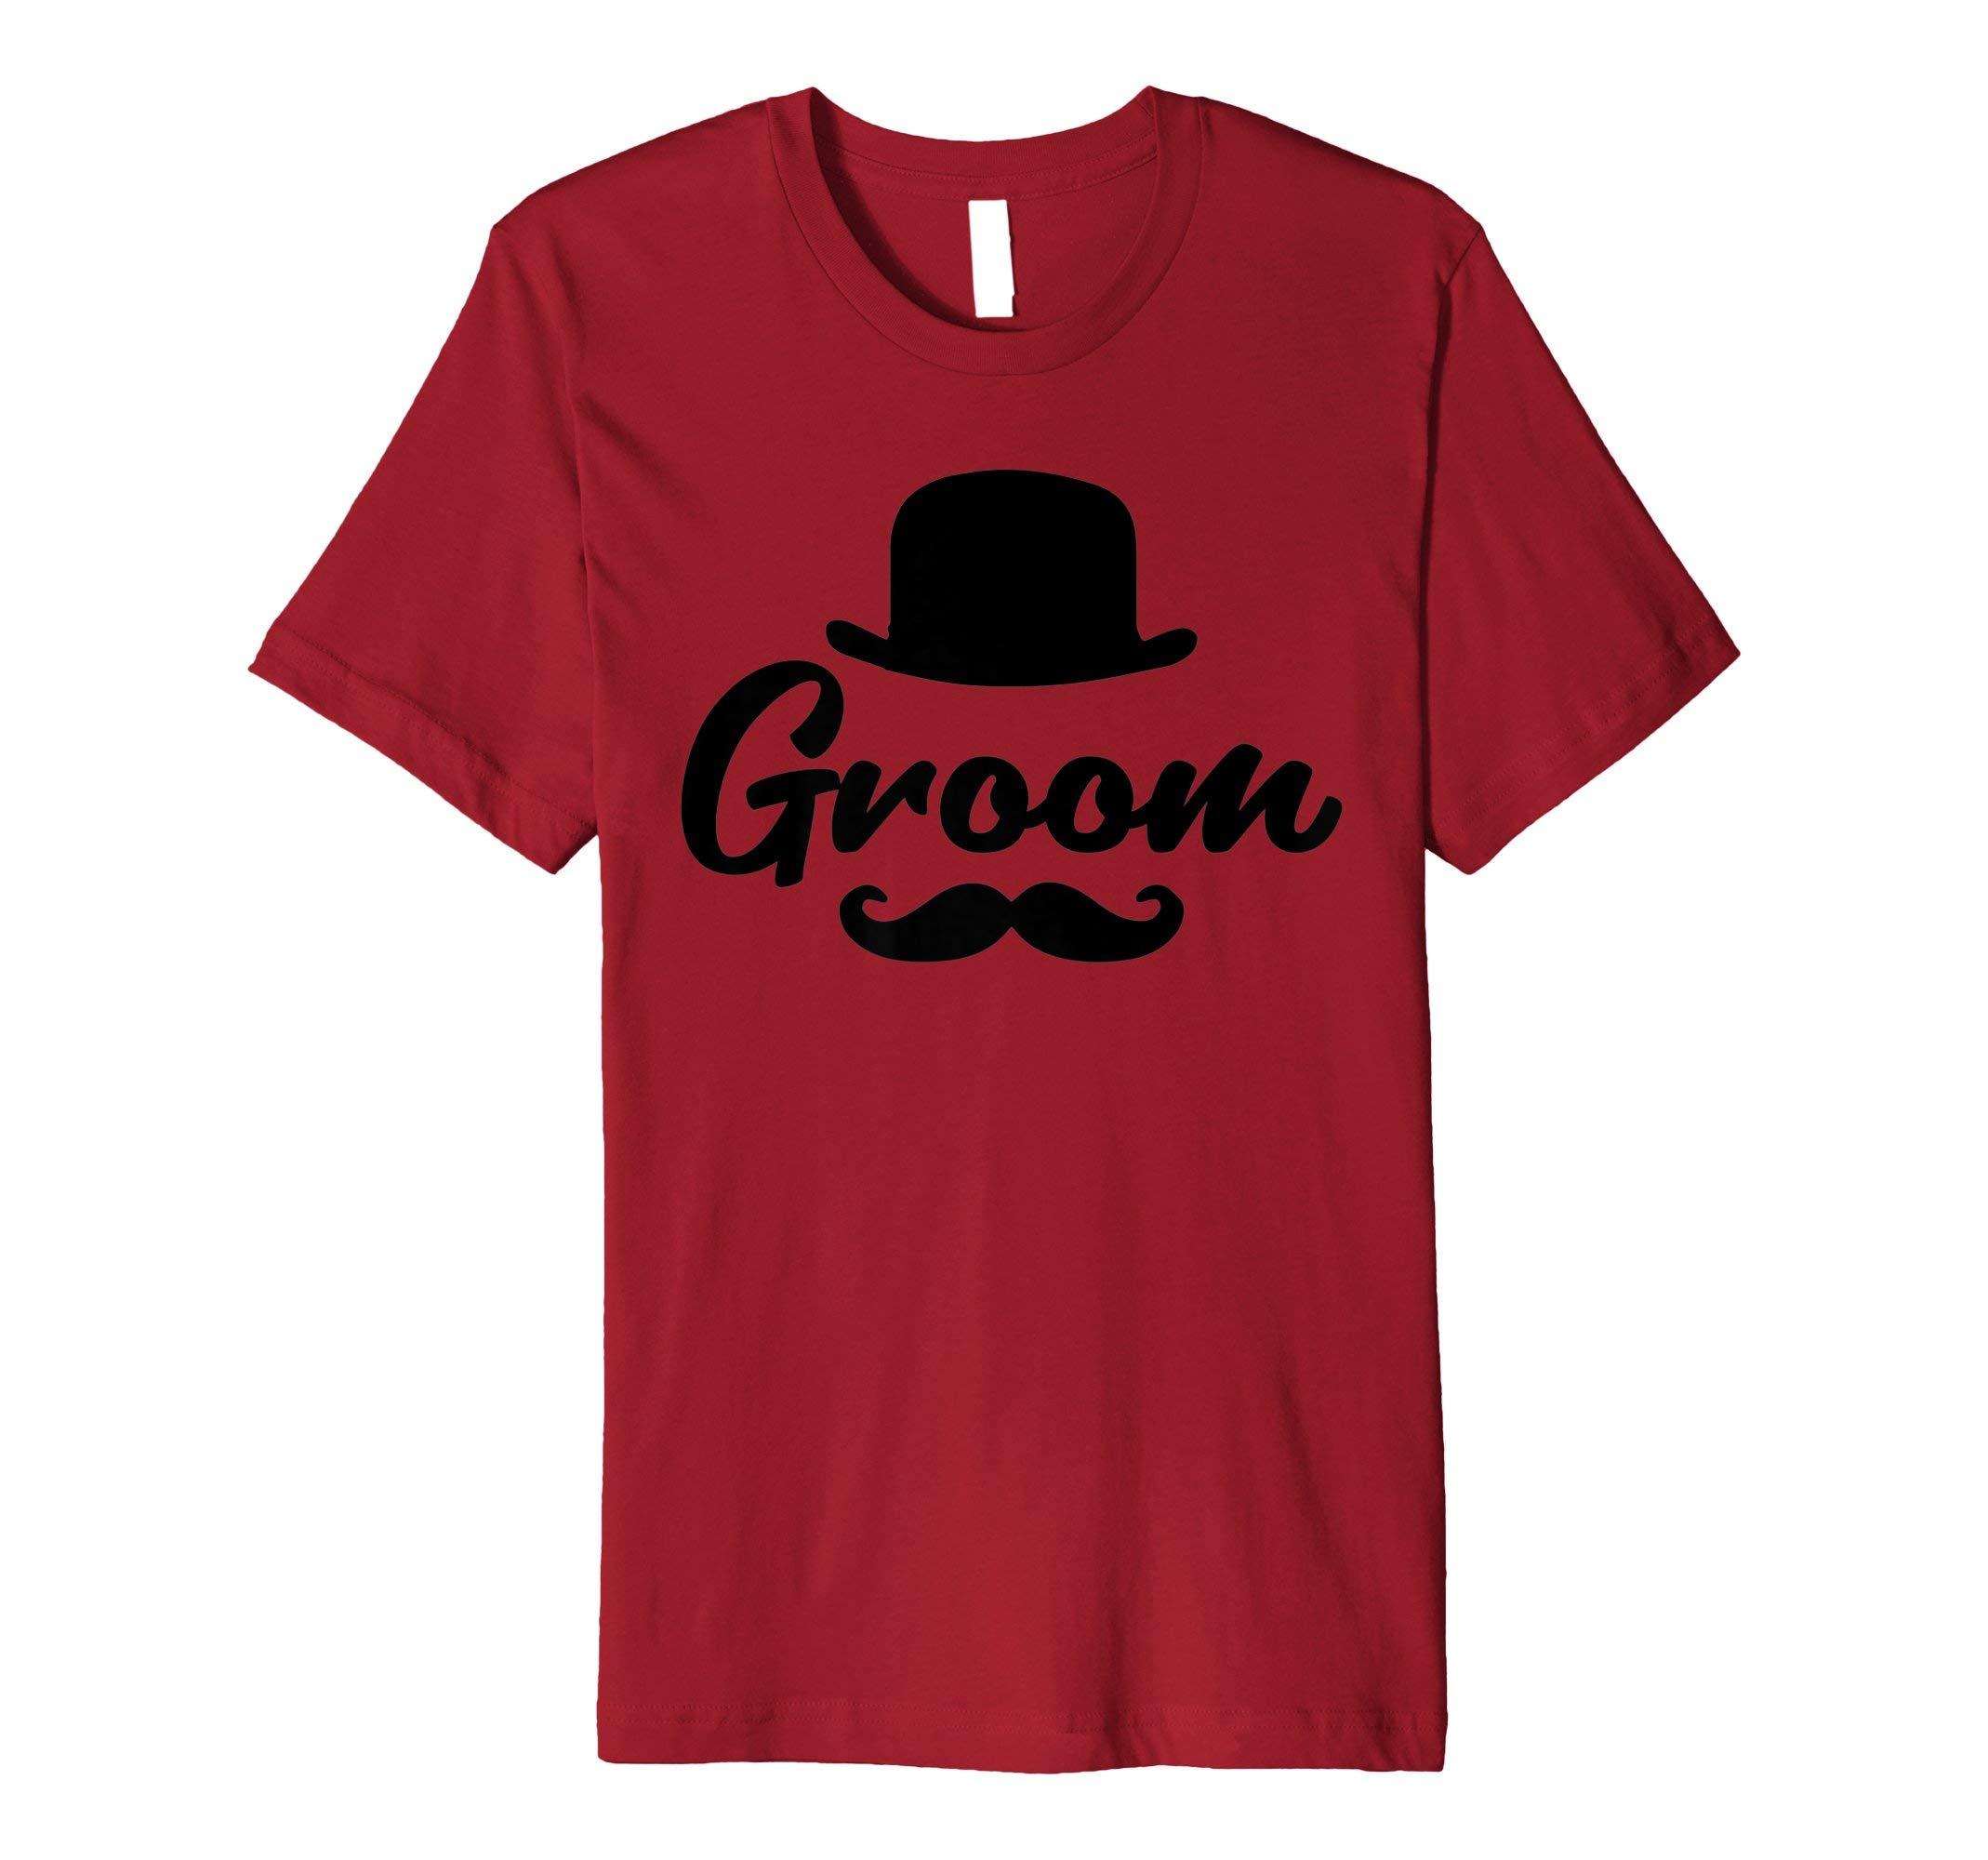 Wedding Shirt Groom Tees Men Boyfriend Husband Mustache Gift